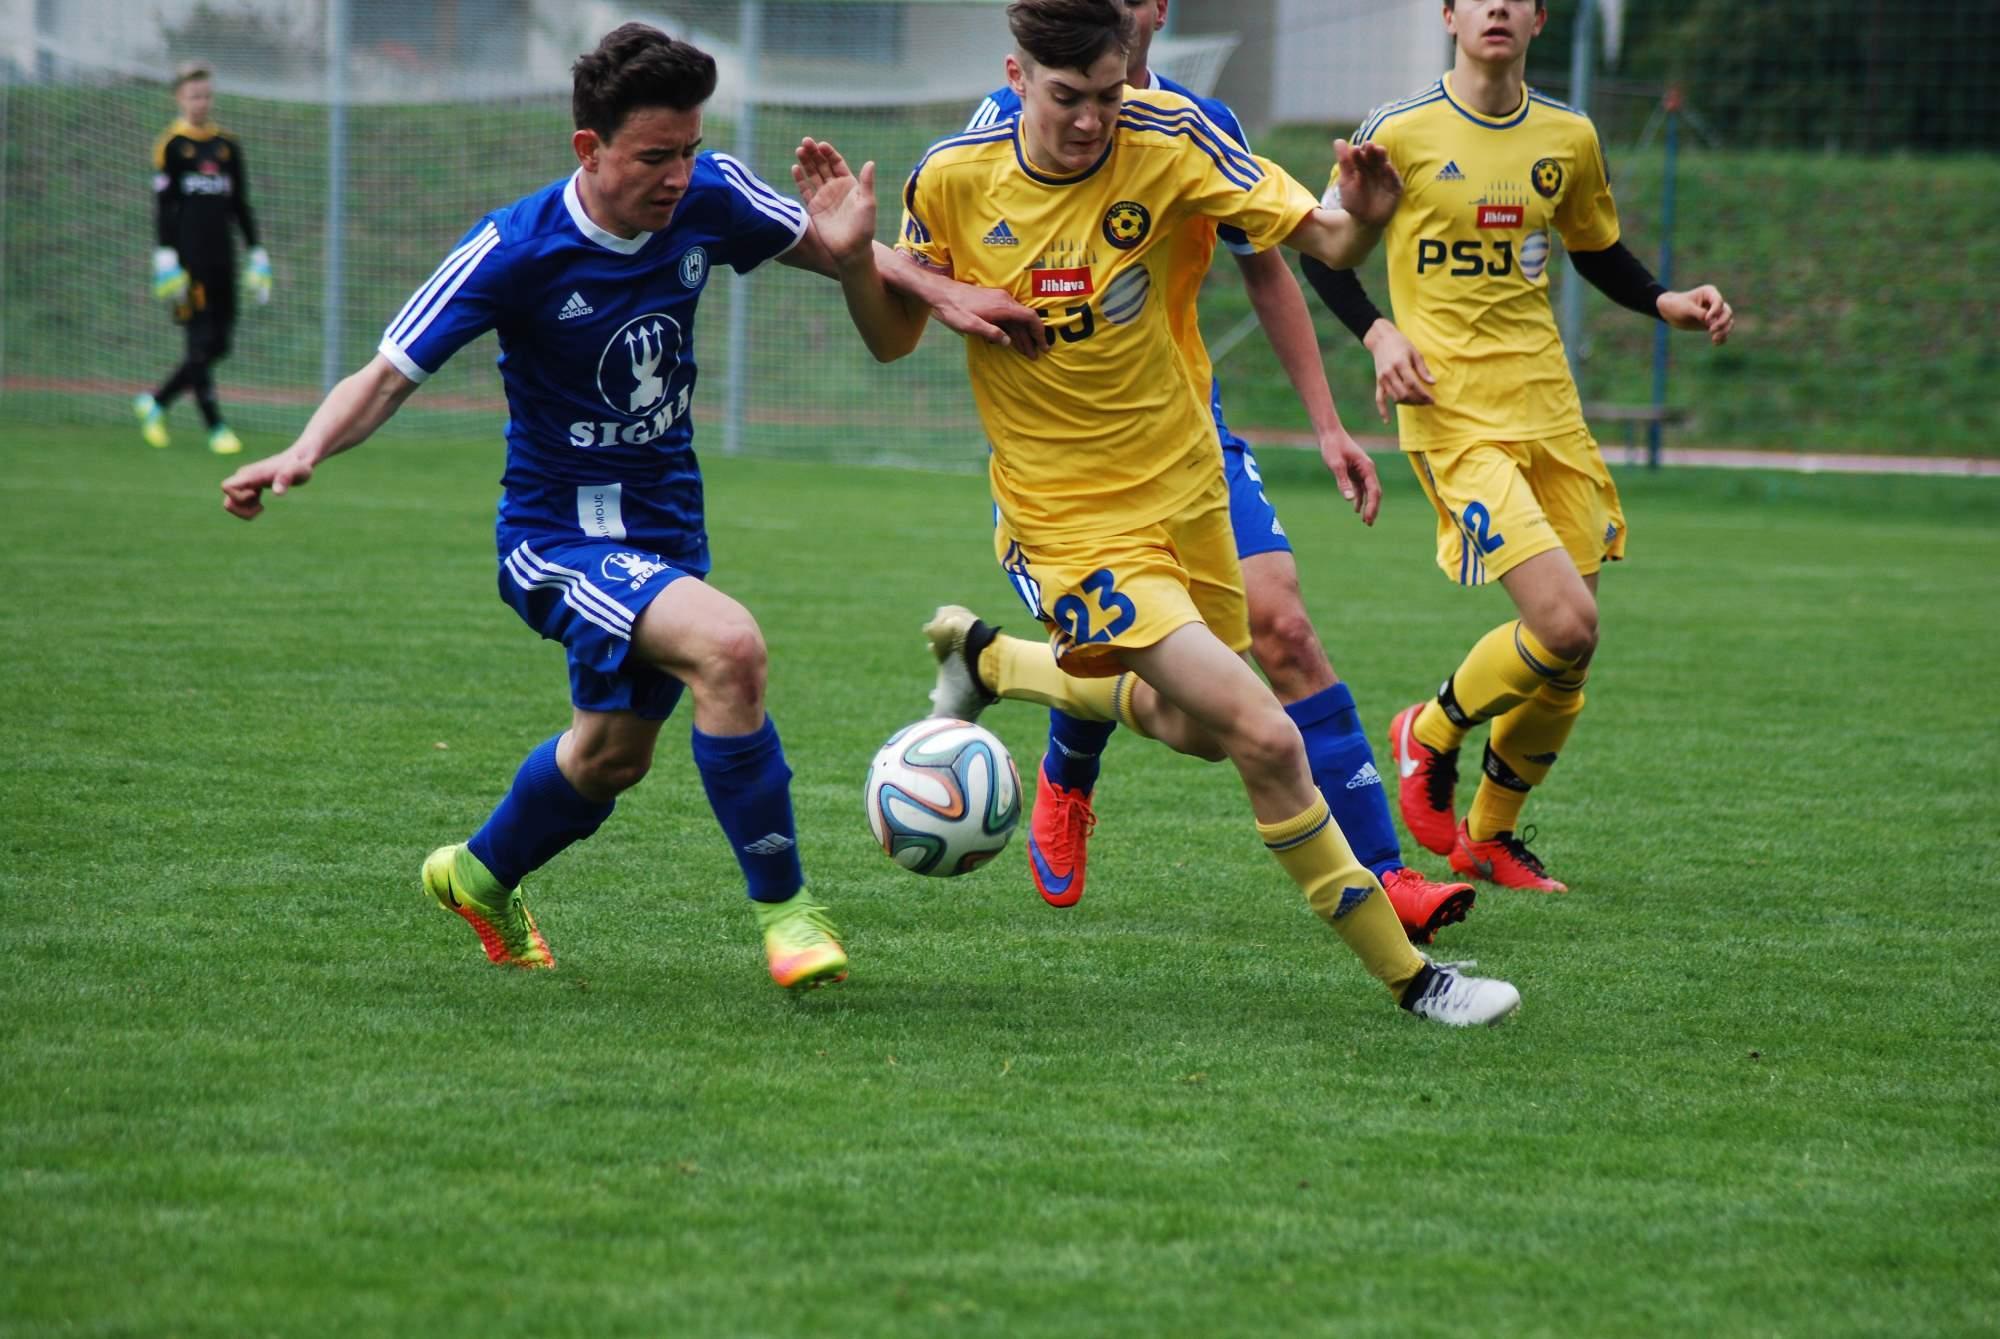 U16: Prohra s favoritem z Olomouce